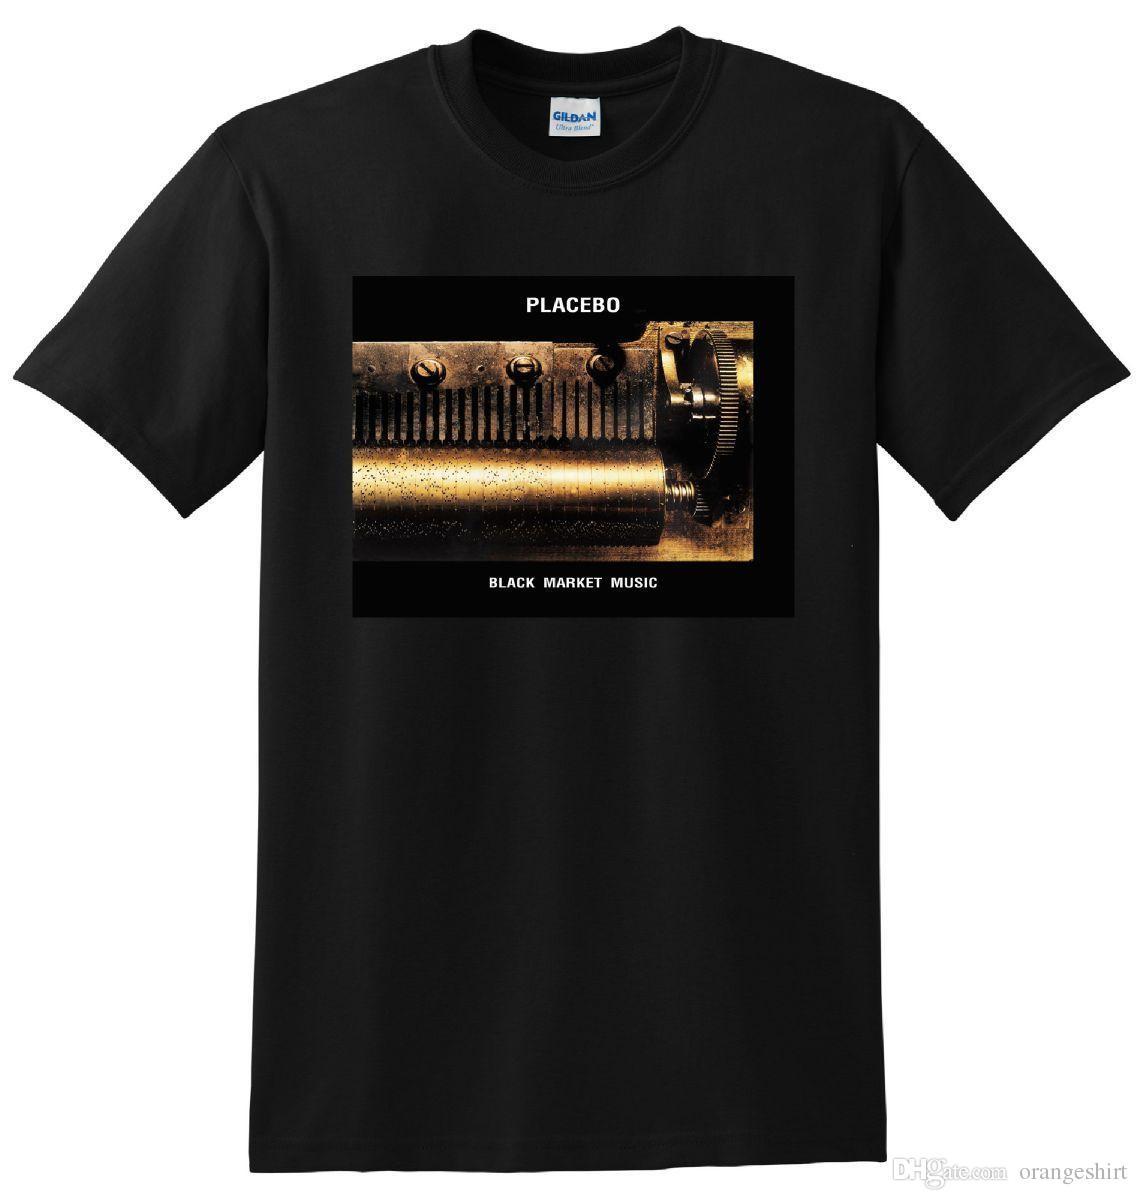 PLACEBO T SHIRT black market music vinyl cover tee SMALL MEDIUM LARGE or XL